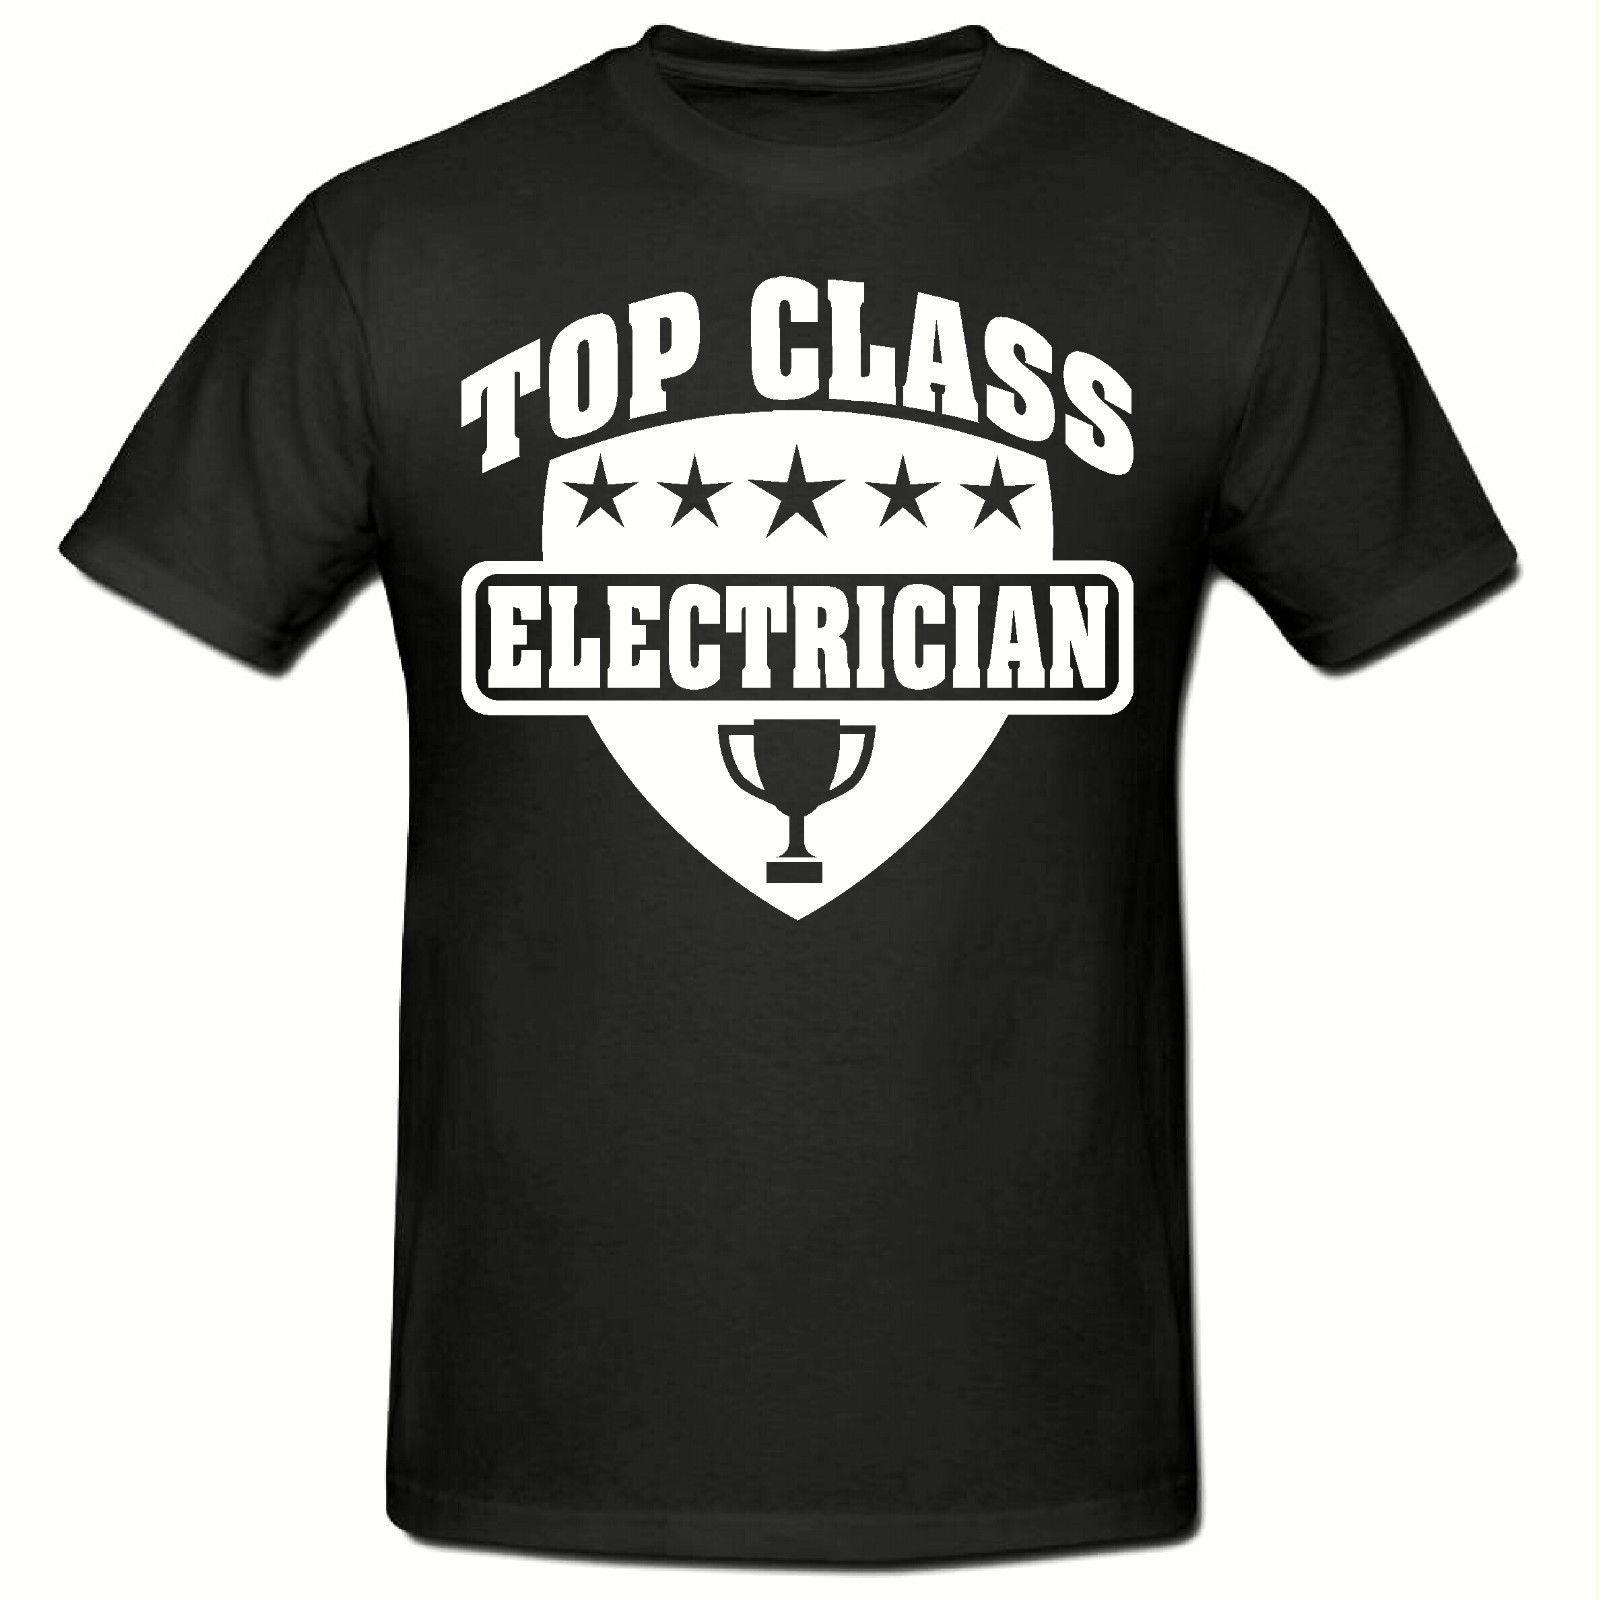 4deea4dd TOP CLASS ELECTRICIAN T SHIRT, FUNNY NOVELTY MEN'S T SHIRT,SM 2XL Short  Sleeve O Neck Fashion Printed Cotton Men T Shirts White Designer T Shirts  Clever T ...